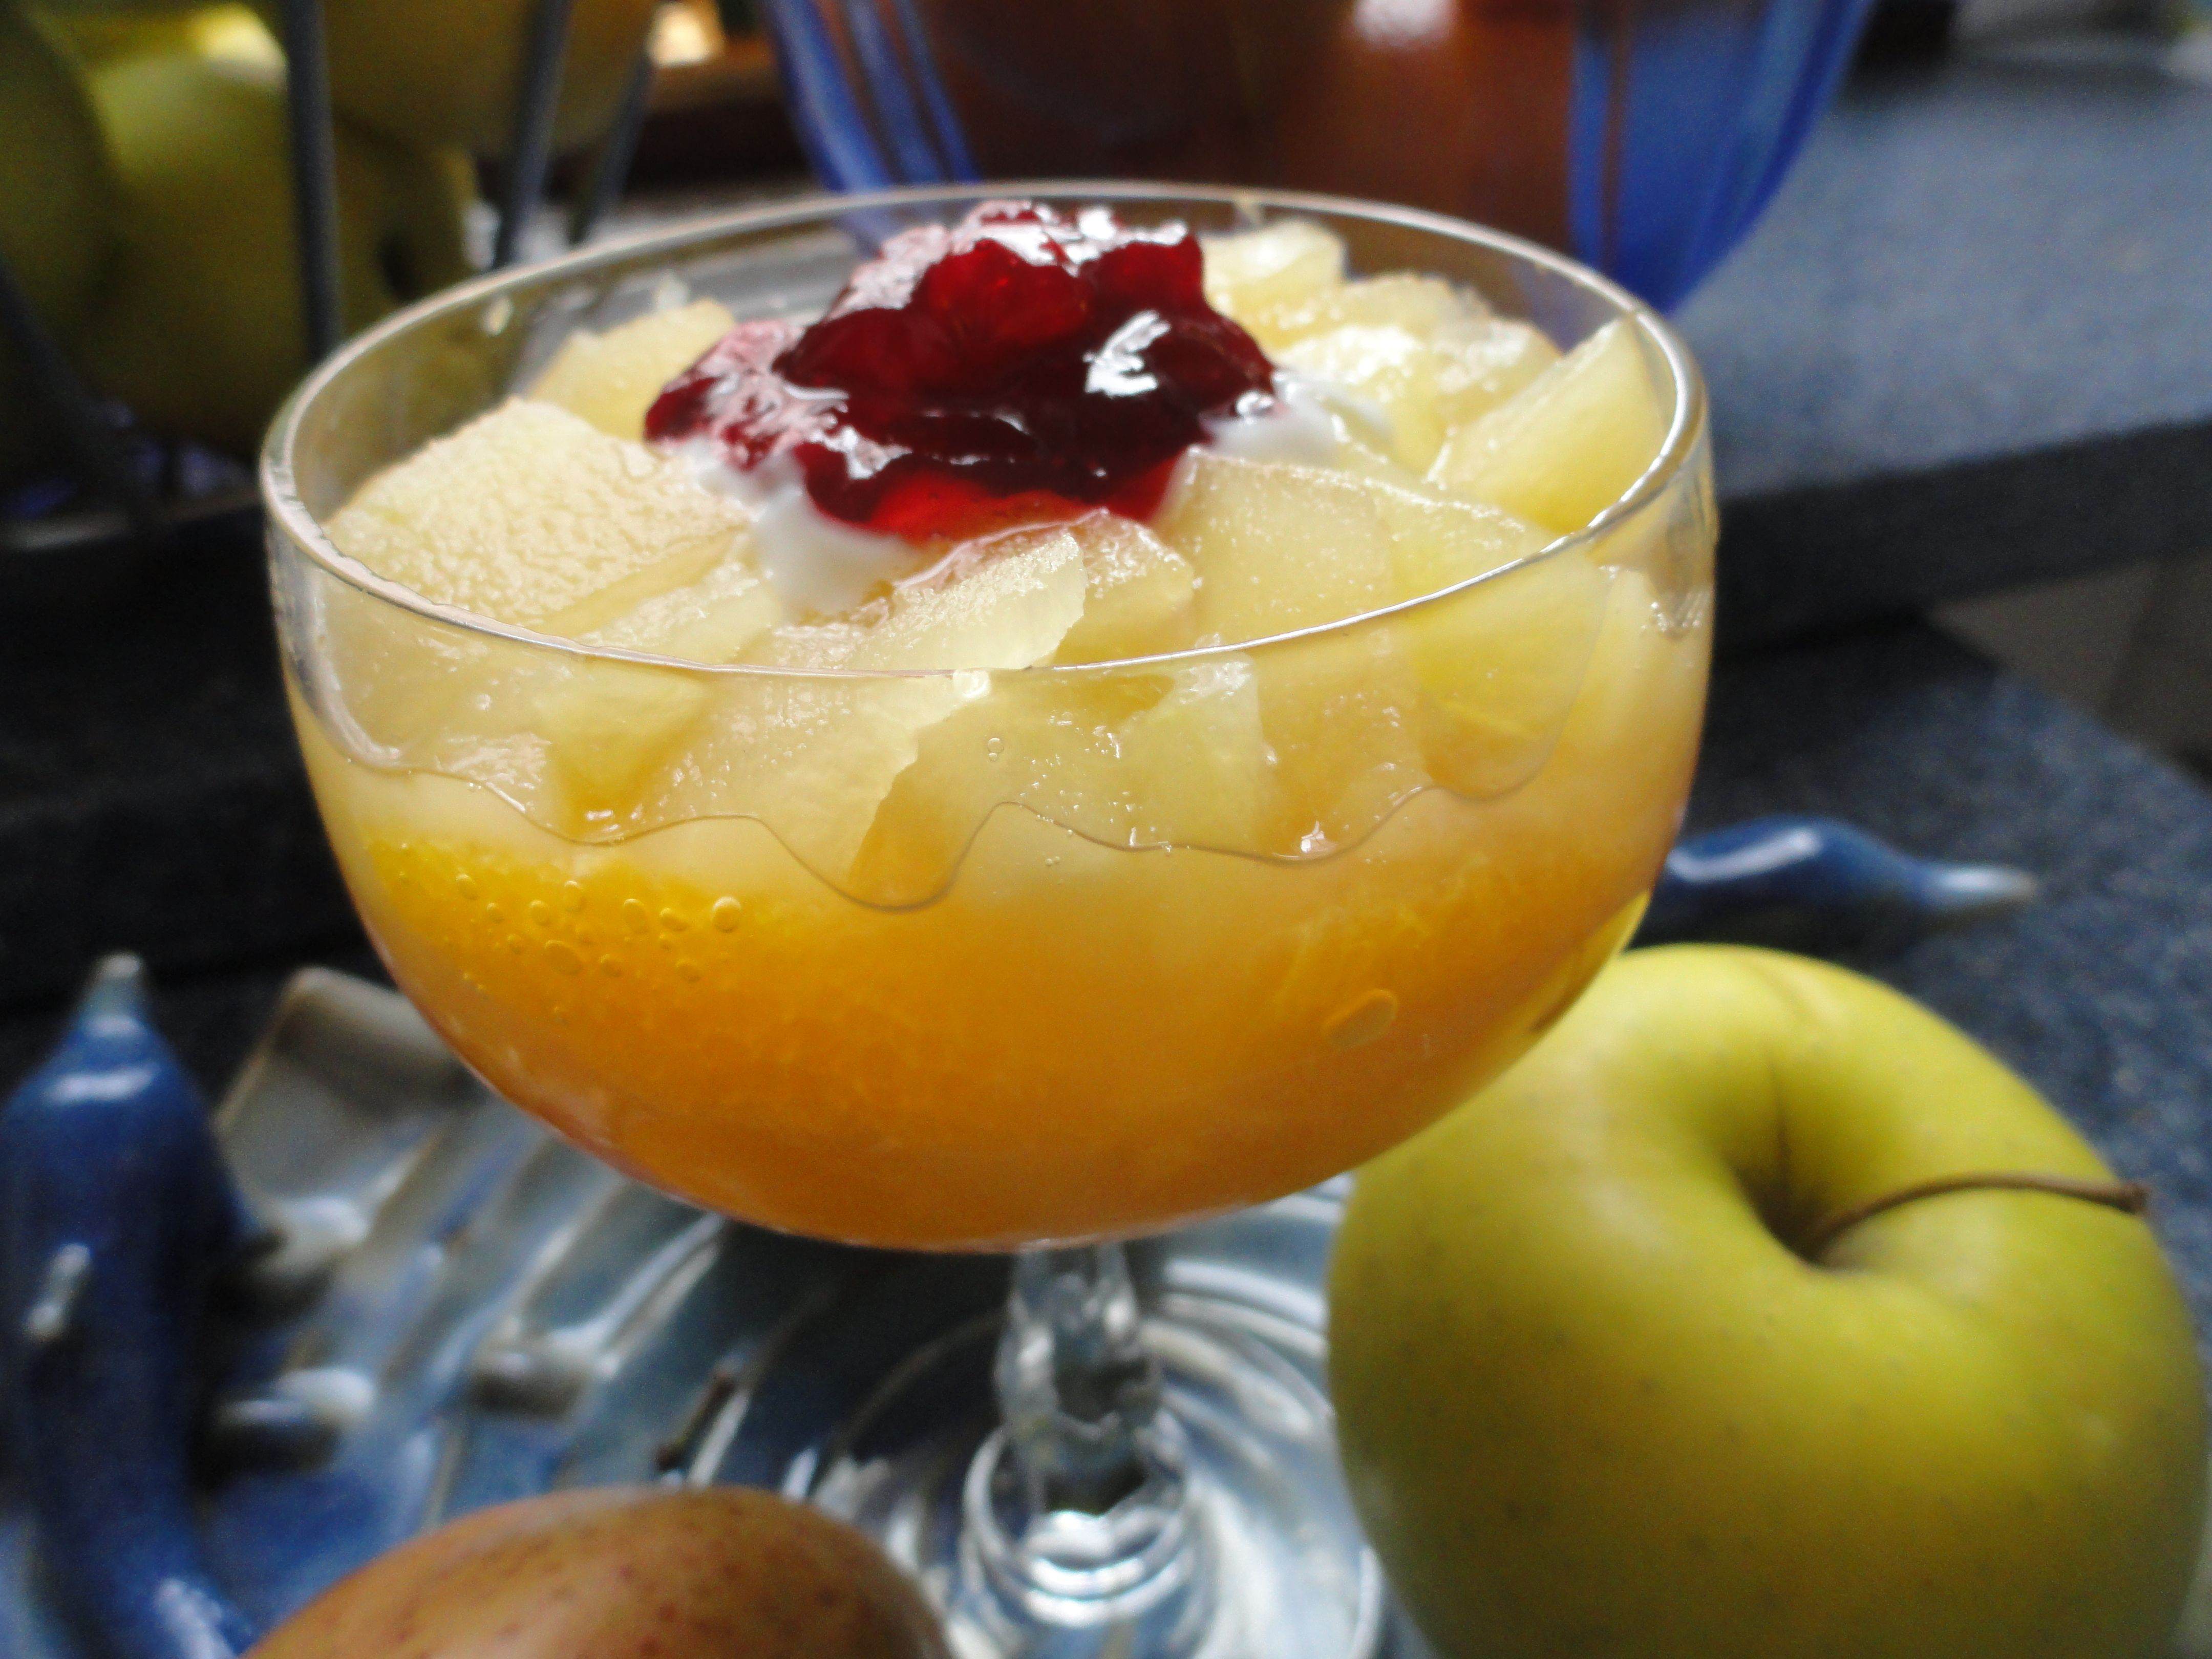 durazno,yogurt natural,manzana y mermelada de guinda